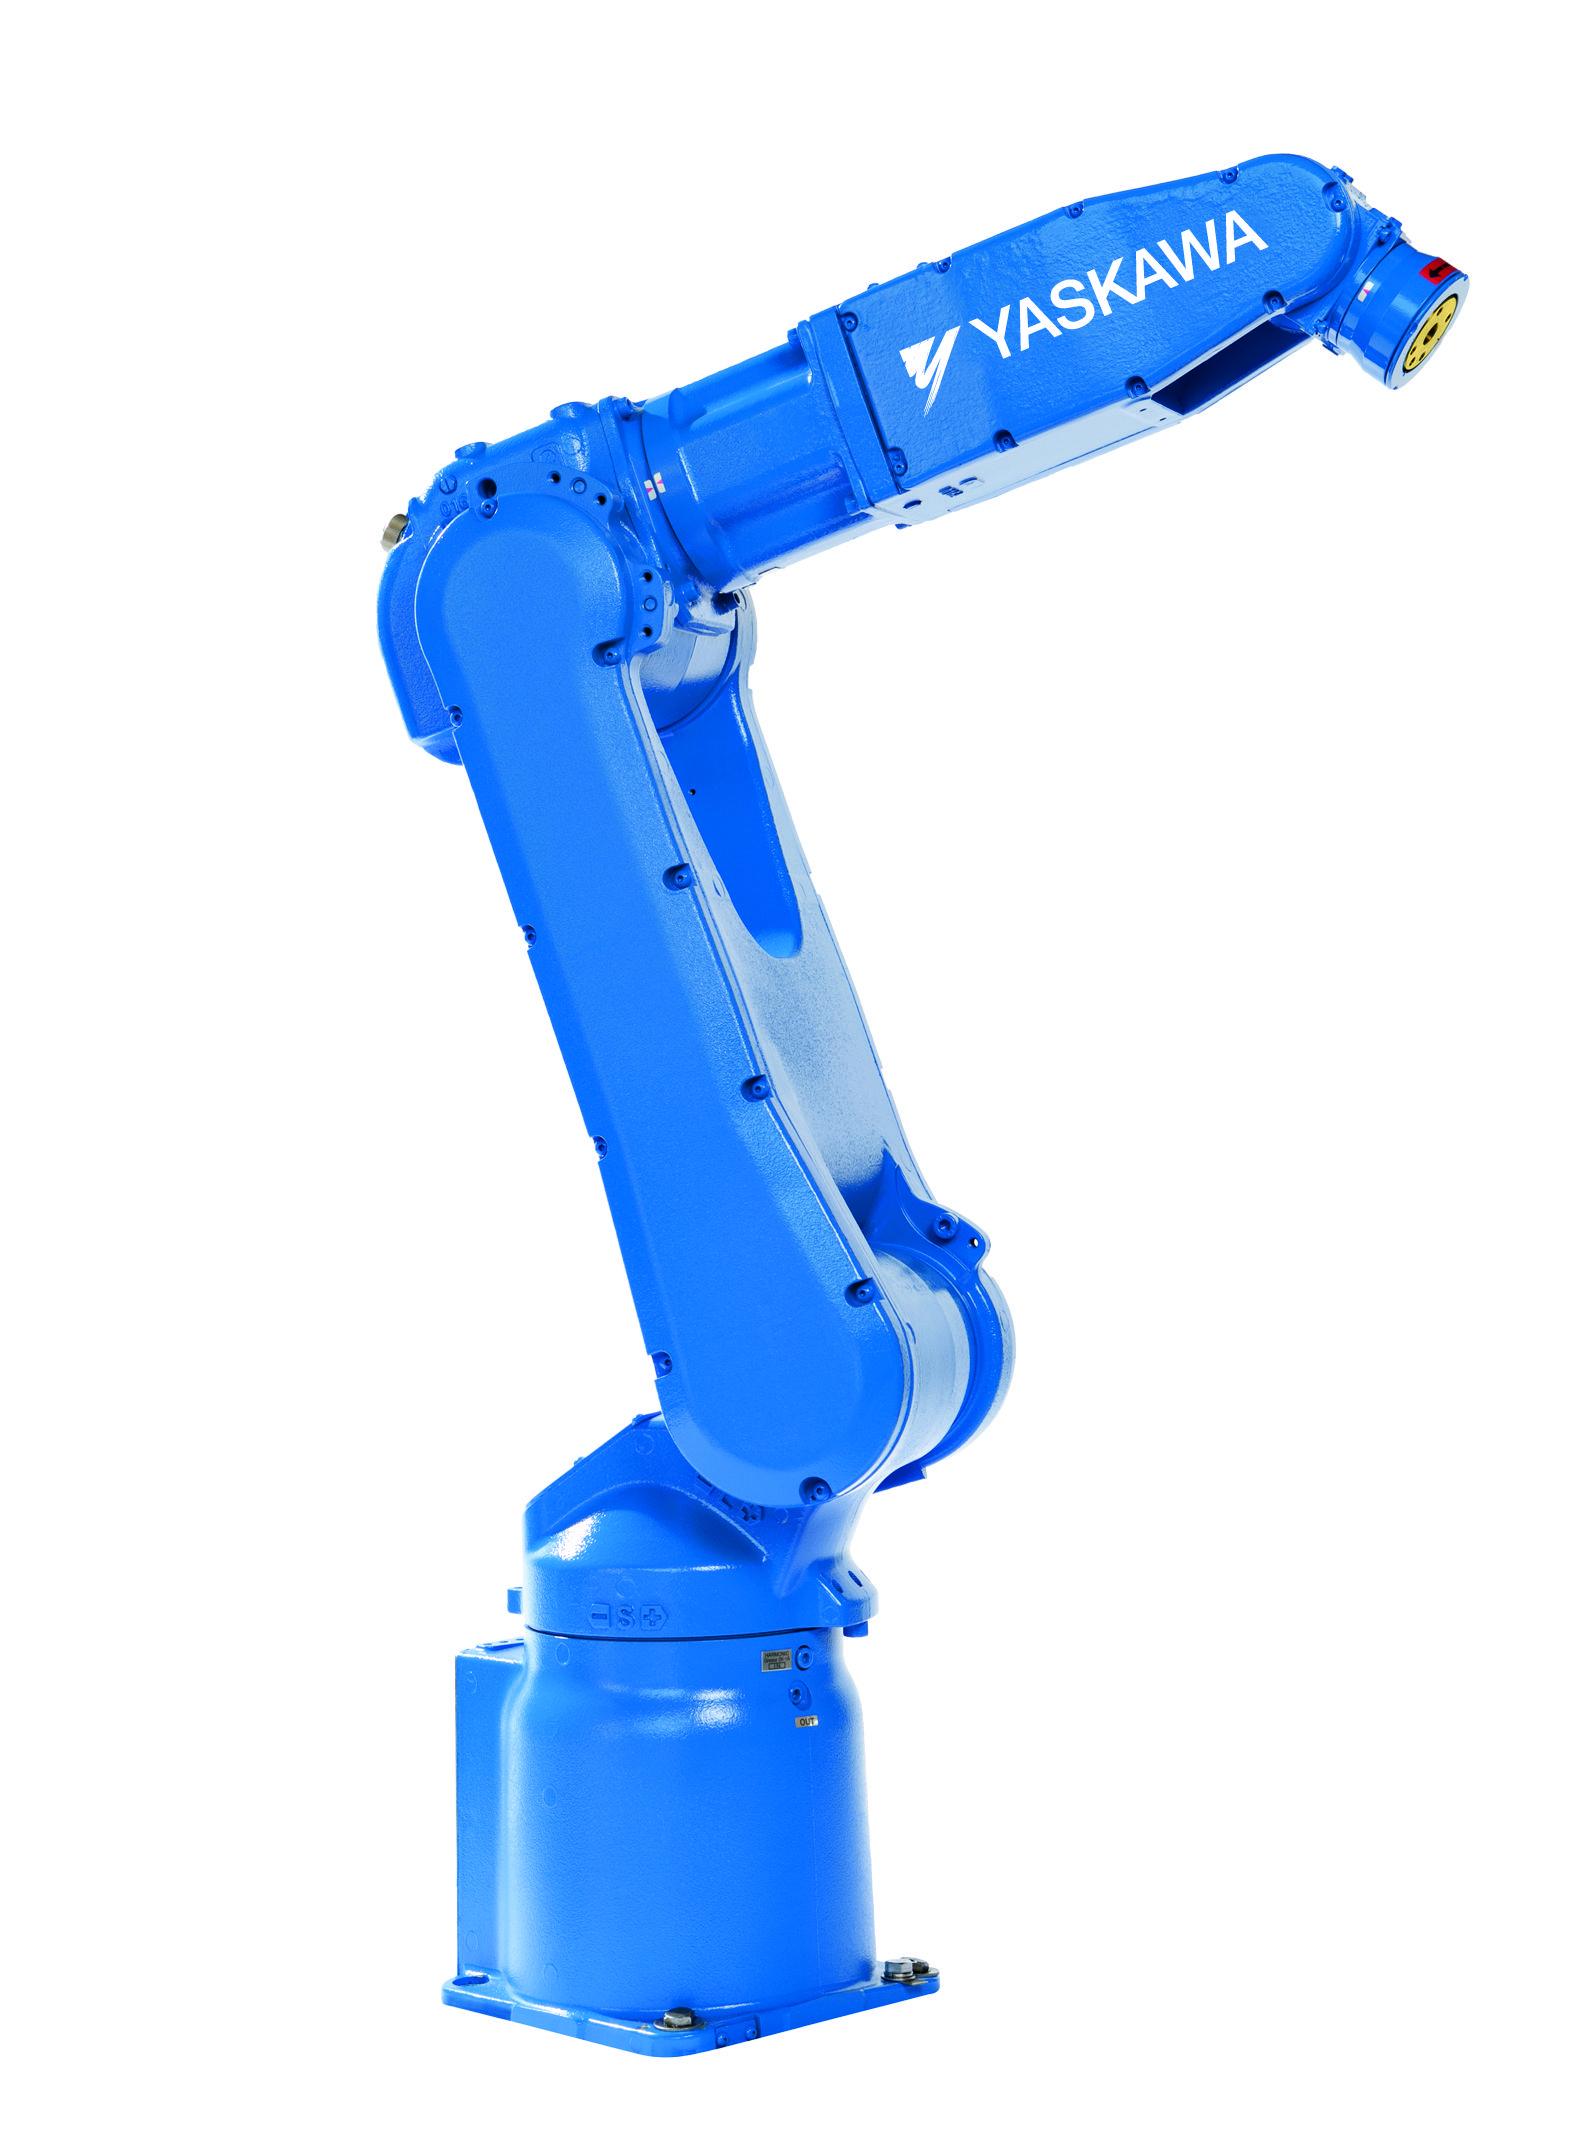 Industrial Robot Yaskawa Motoman MH5 | Robotics and Engineering